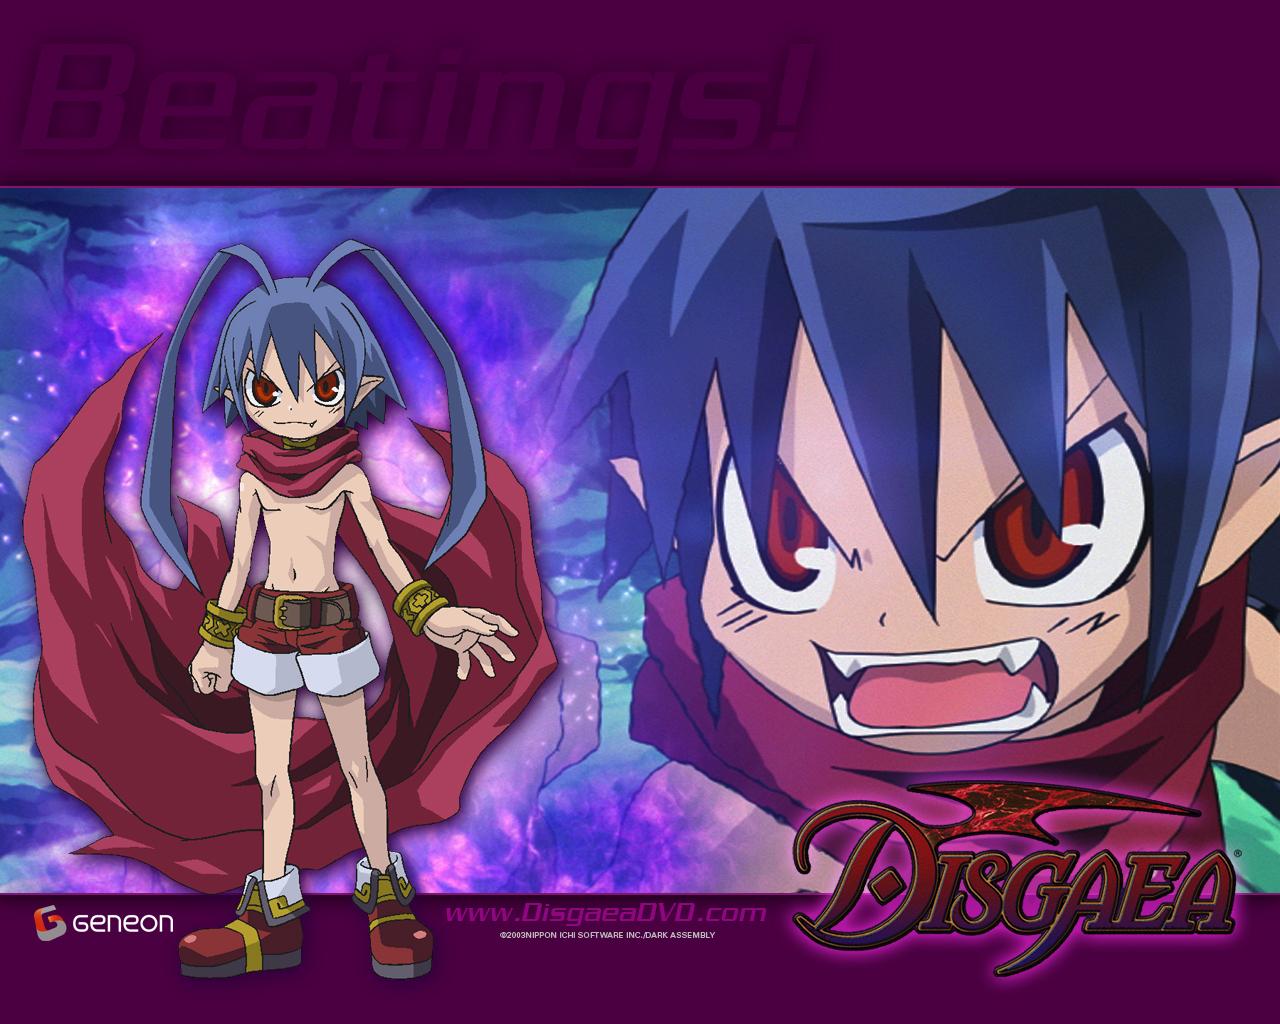 Disgaea absolute anime - Disgaea etna wallpaper ...